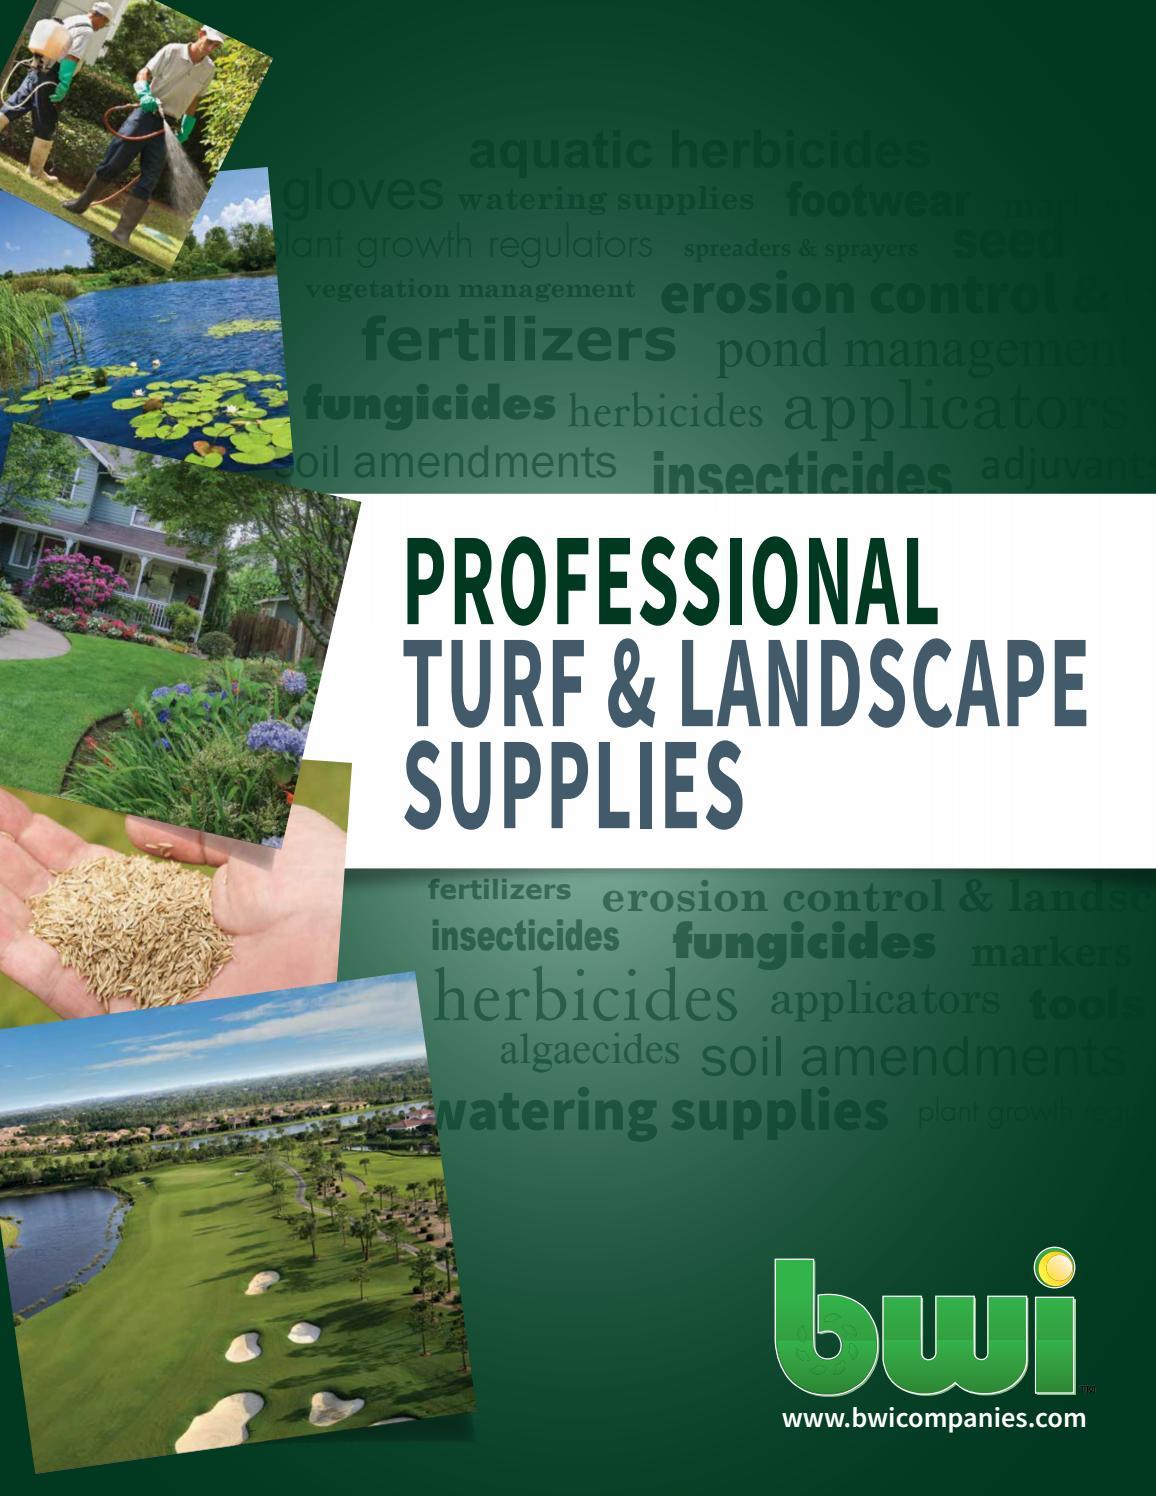 Bwi Professional Turf Landscape Catalog By Bwi Companies Inc Issuu